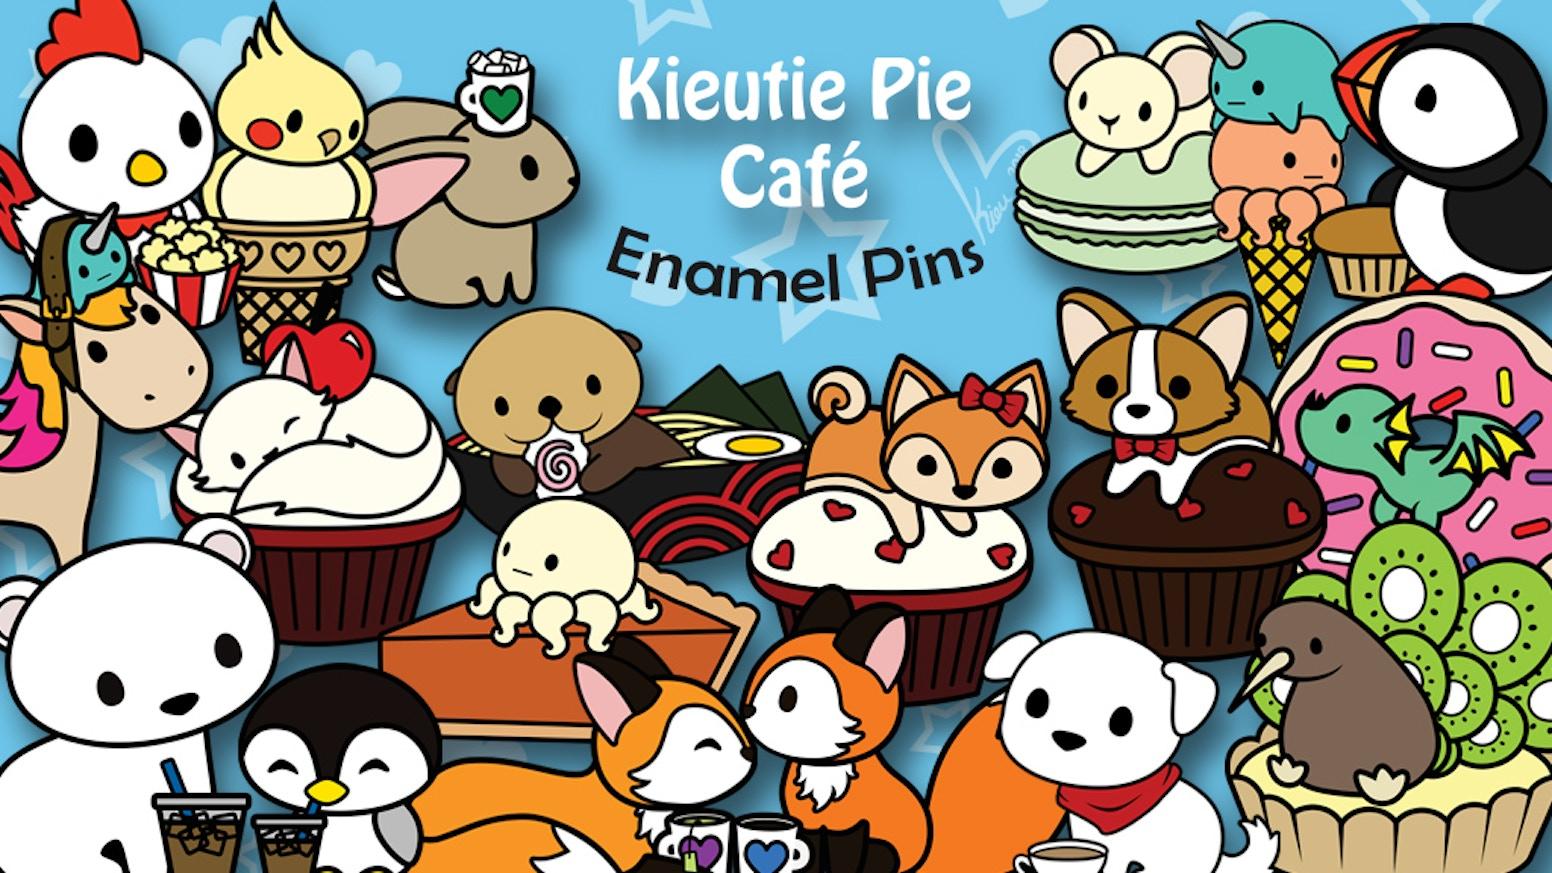 Welcome to Kieutie Pie Café! Help bring these Kieutie Pies; Tea Fox, Cocoa Bunny, & Cupcake Kitten, to life as shiny hard enamel pins!